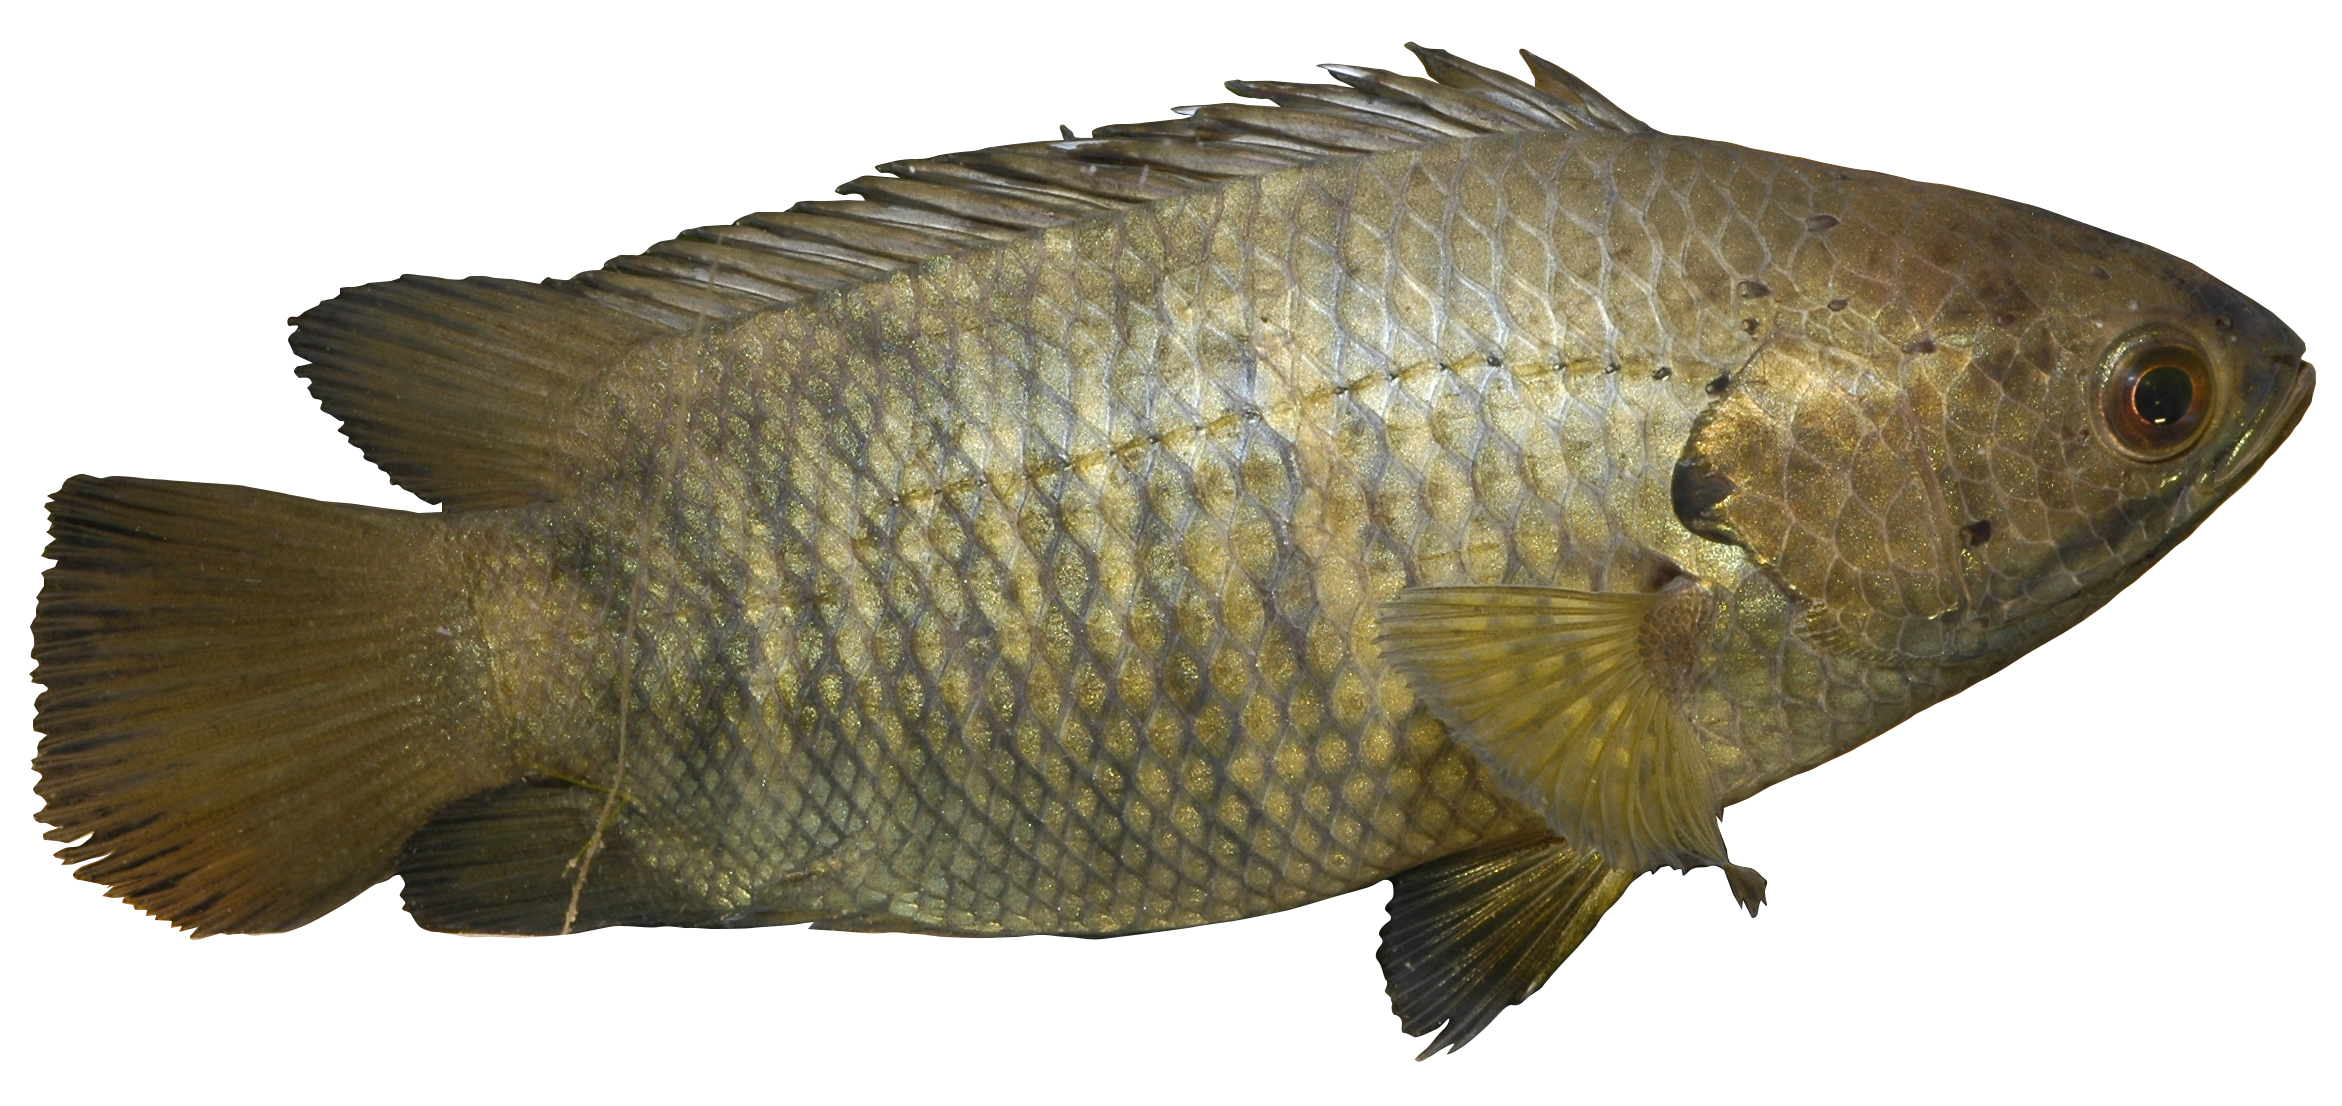 Climbing perch: declared noxious fish